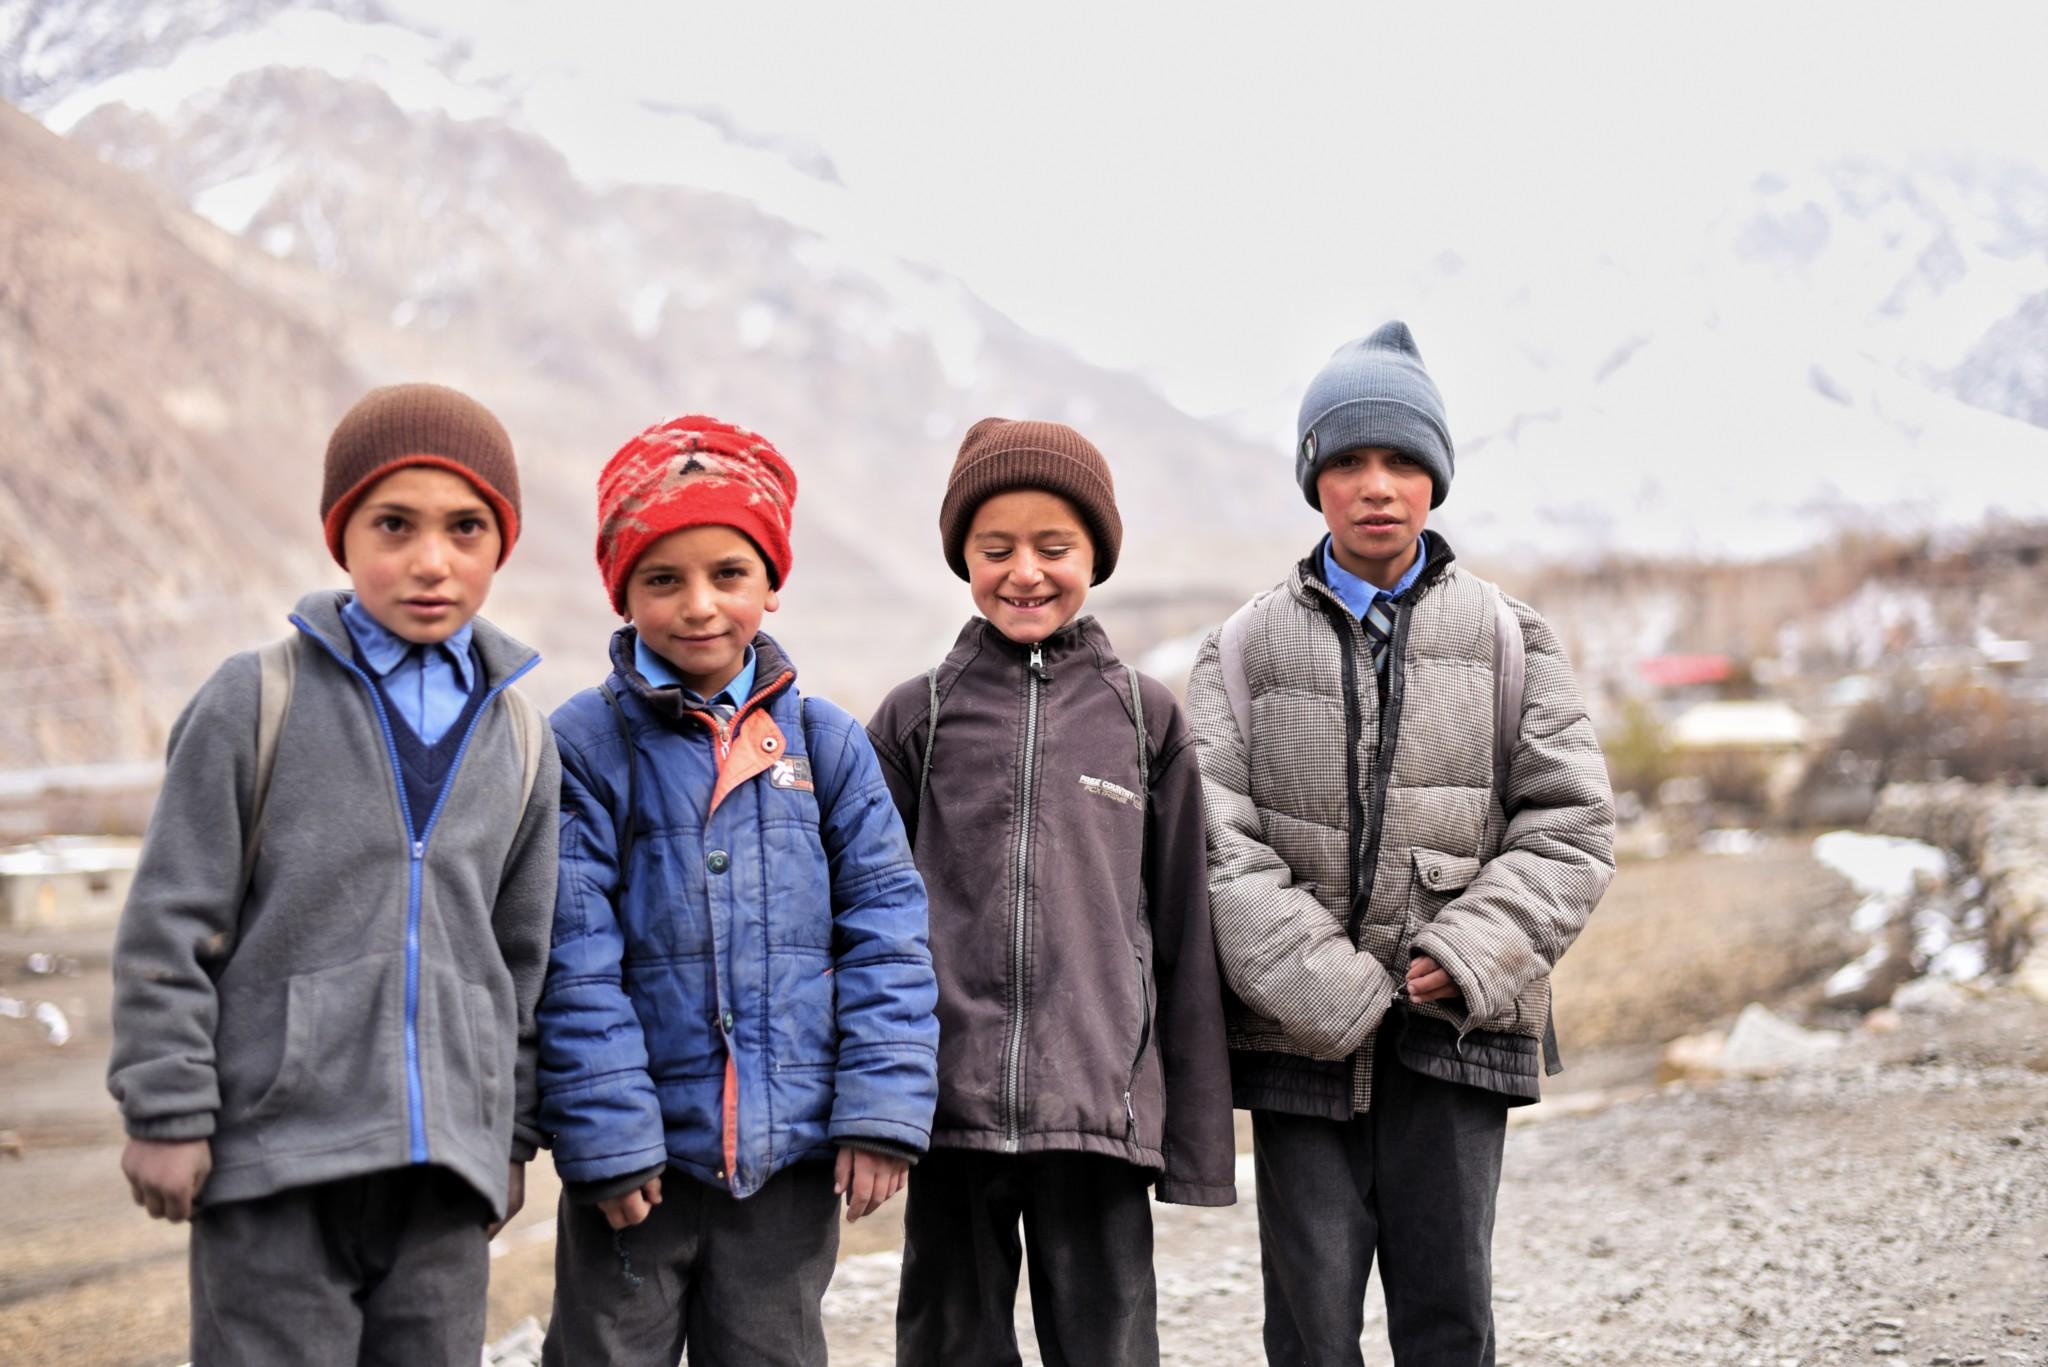 Kids im Norden Pakistans